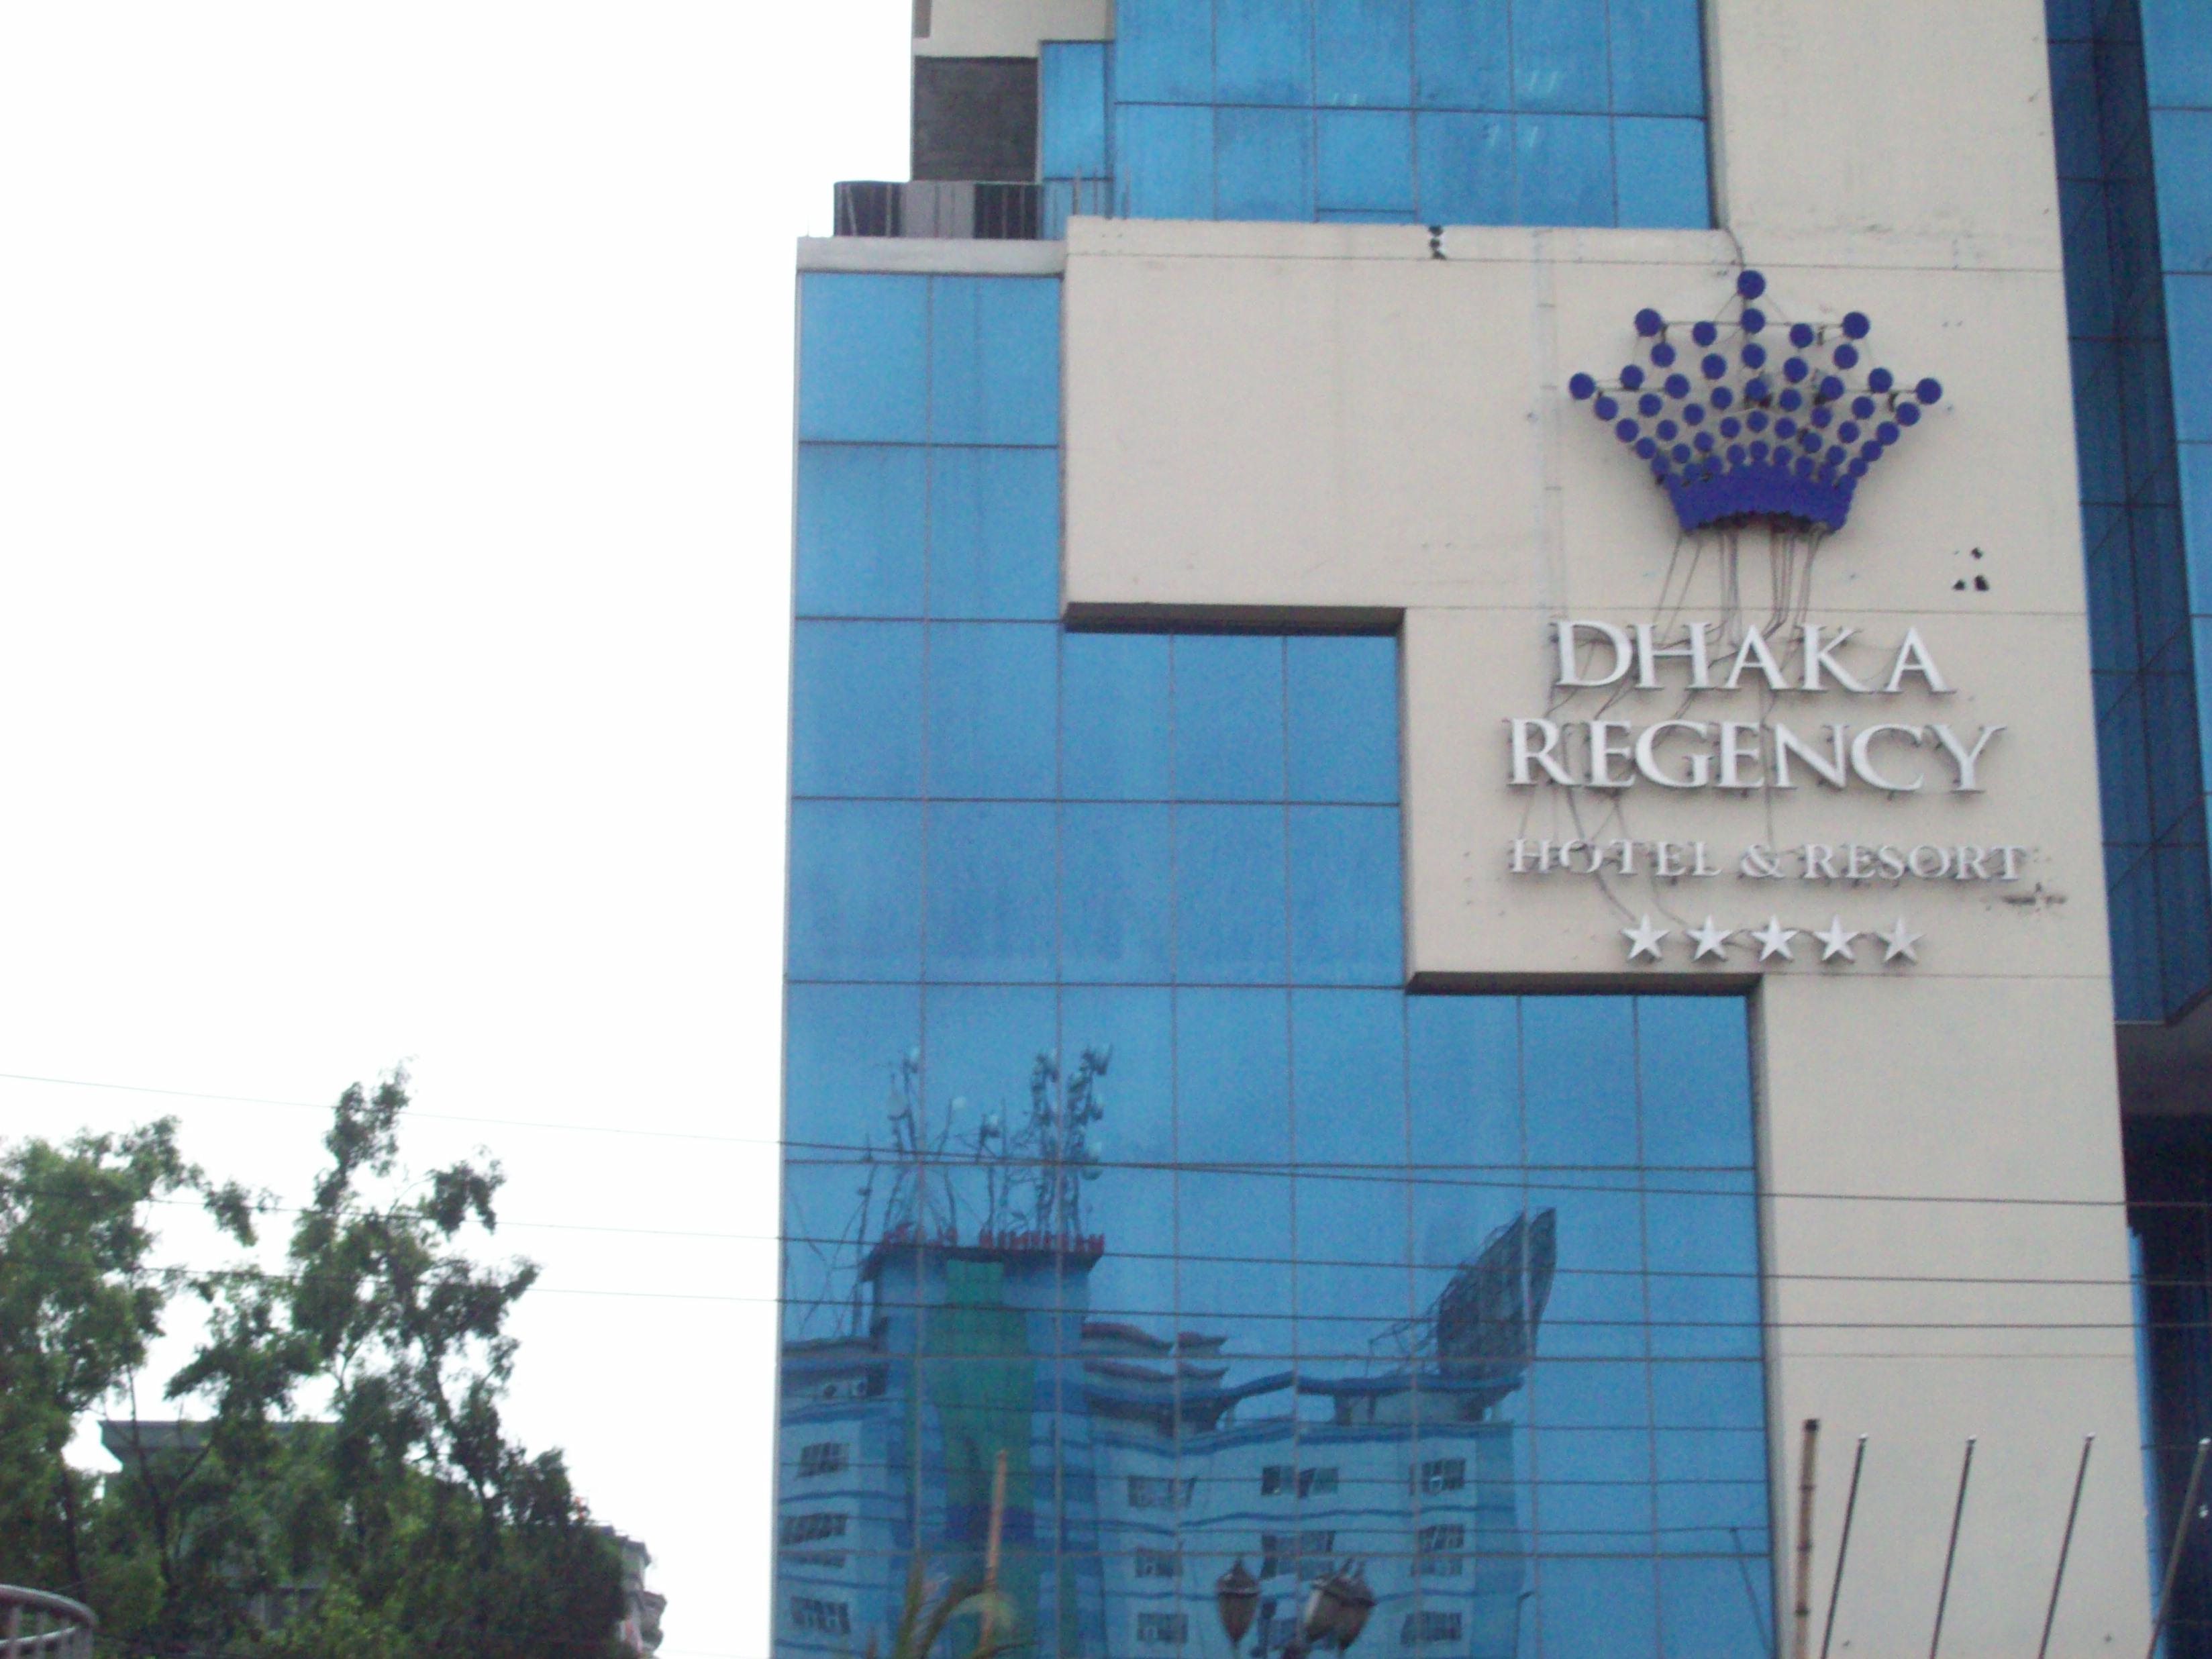 Dhaka regency hotel